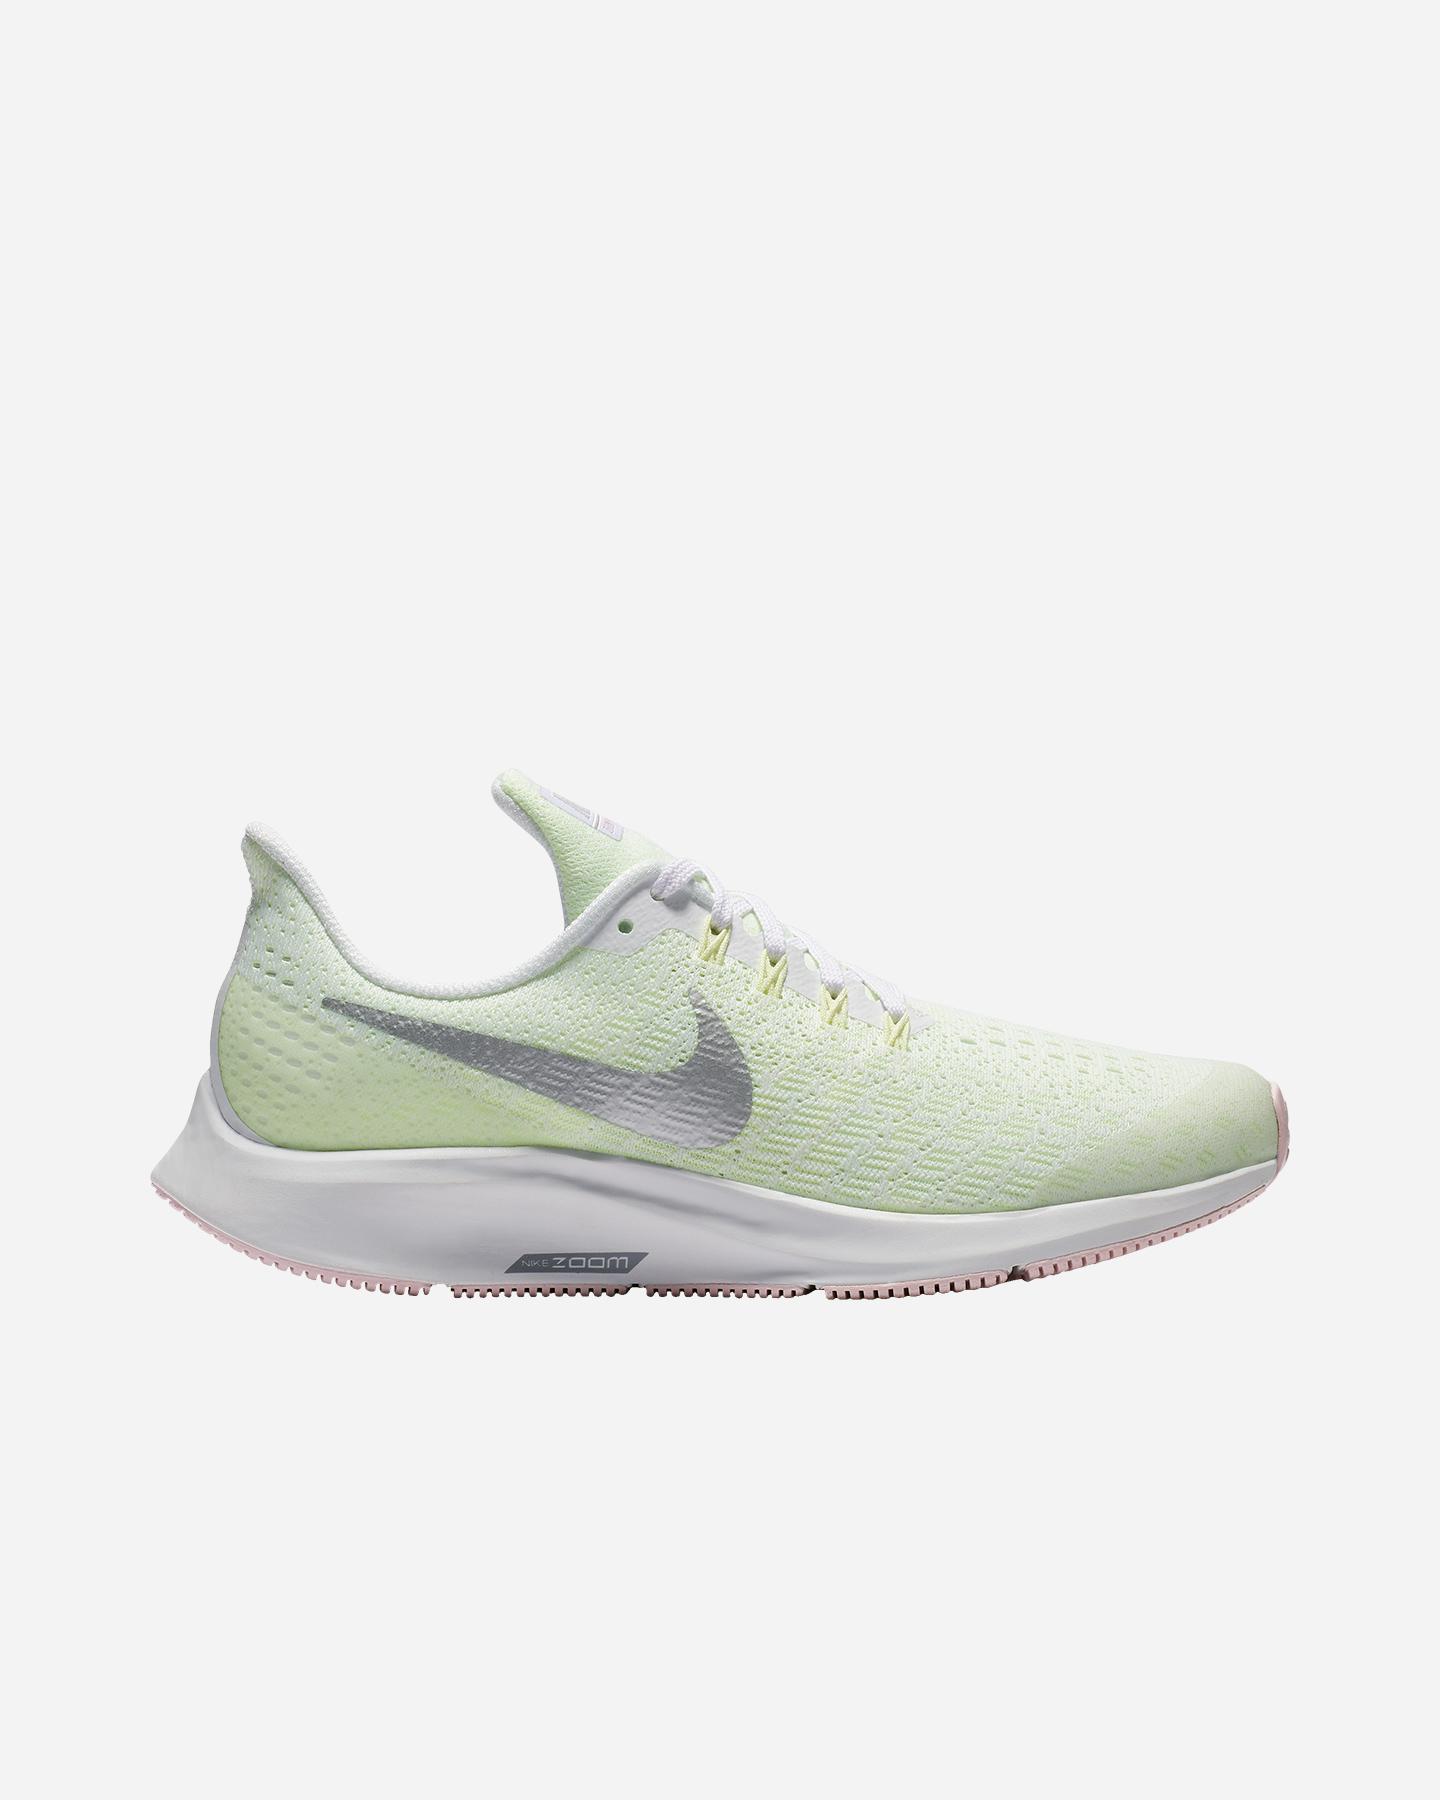 2nike numero 35 scarpe